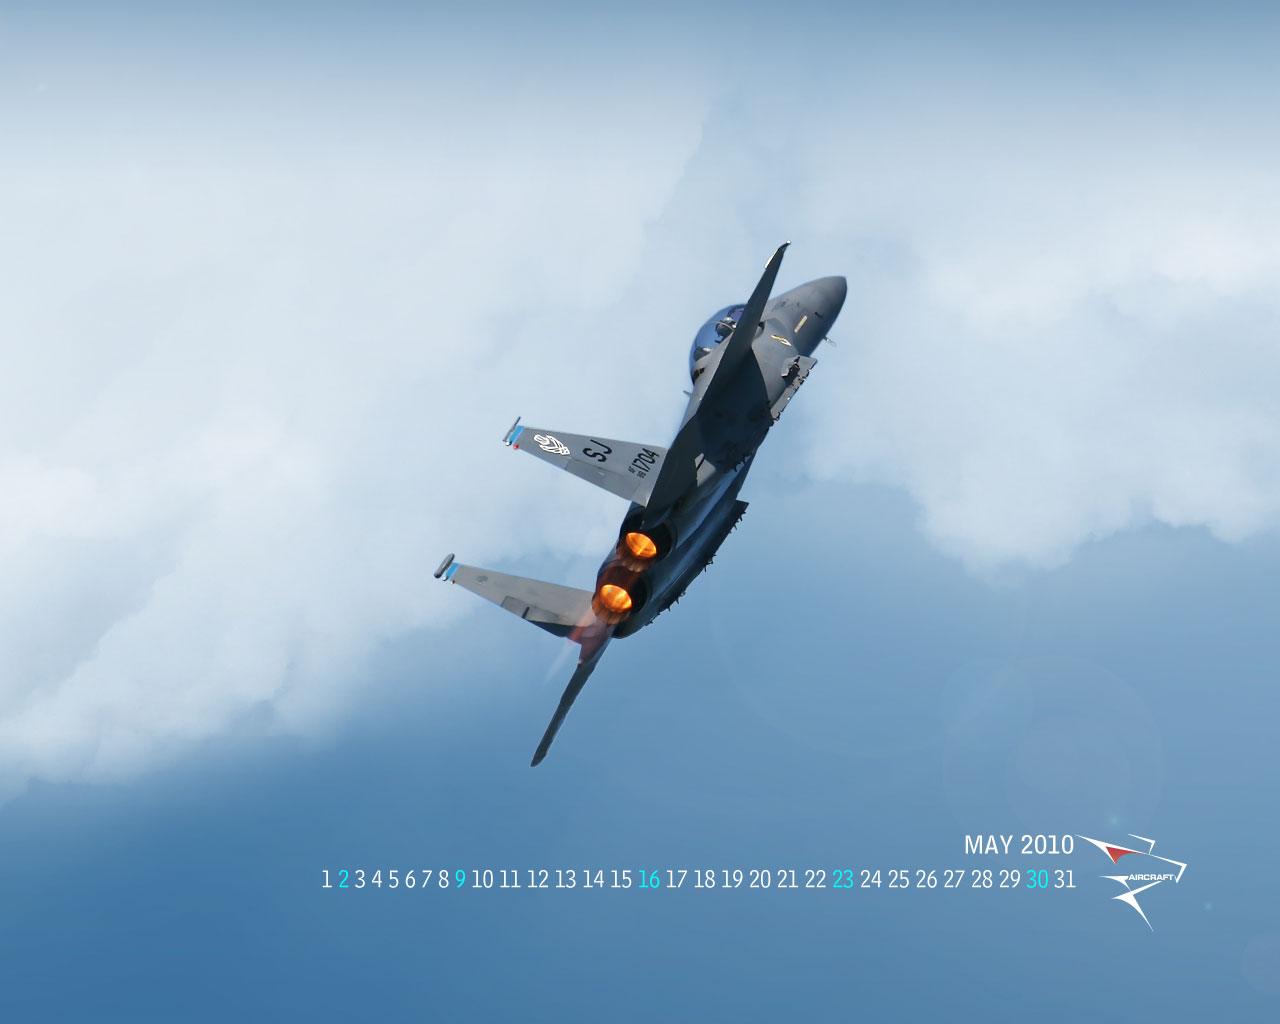 0045_F-15E_1280x1024_wallpaper.jpg